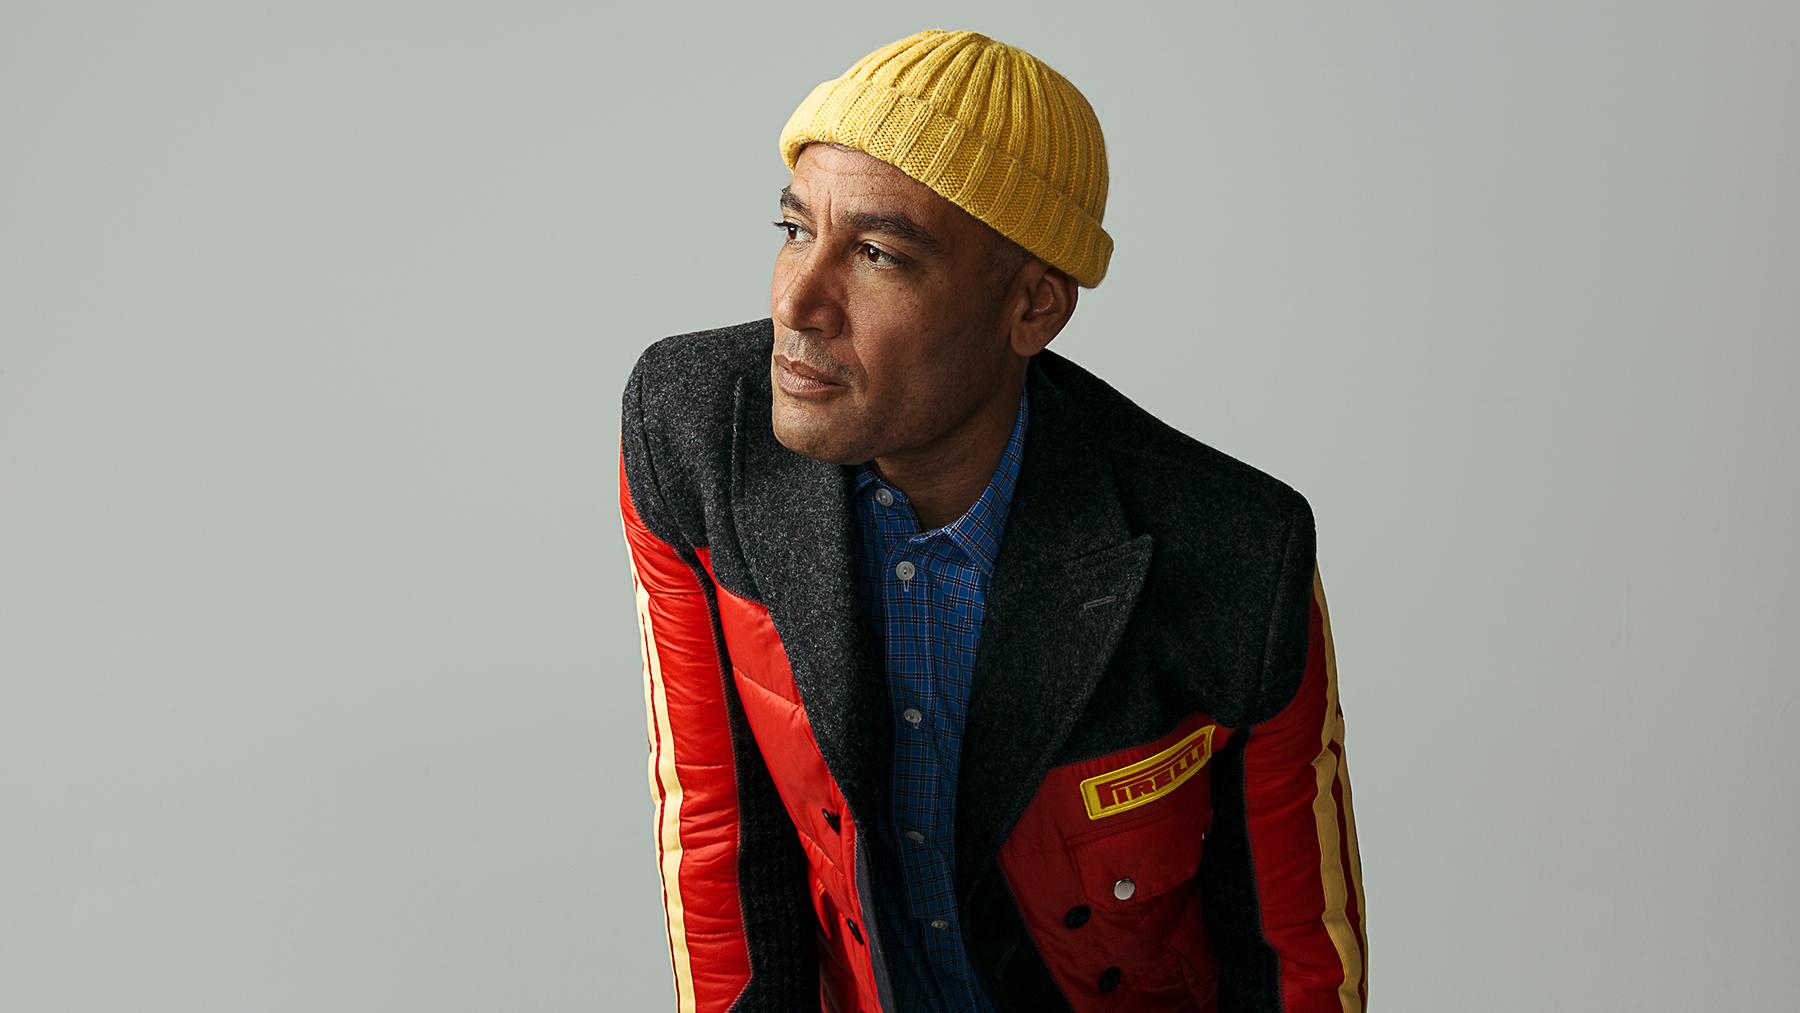 Three-time Grammy Award winner Ben Harper plays a mix of blues, folk, soul, reggae and rock. Photo by Jacob Boll